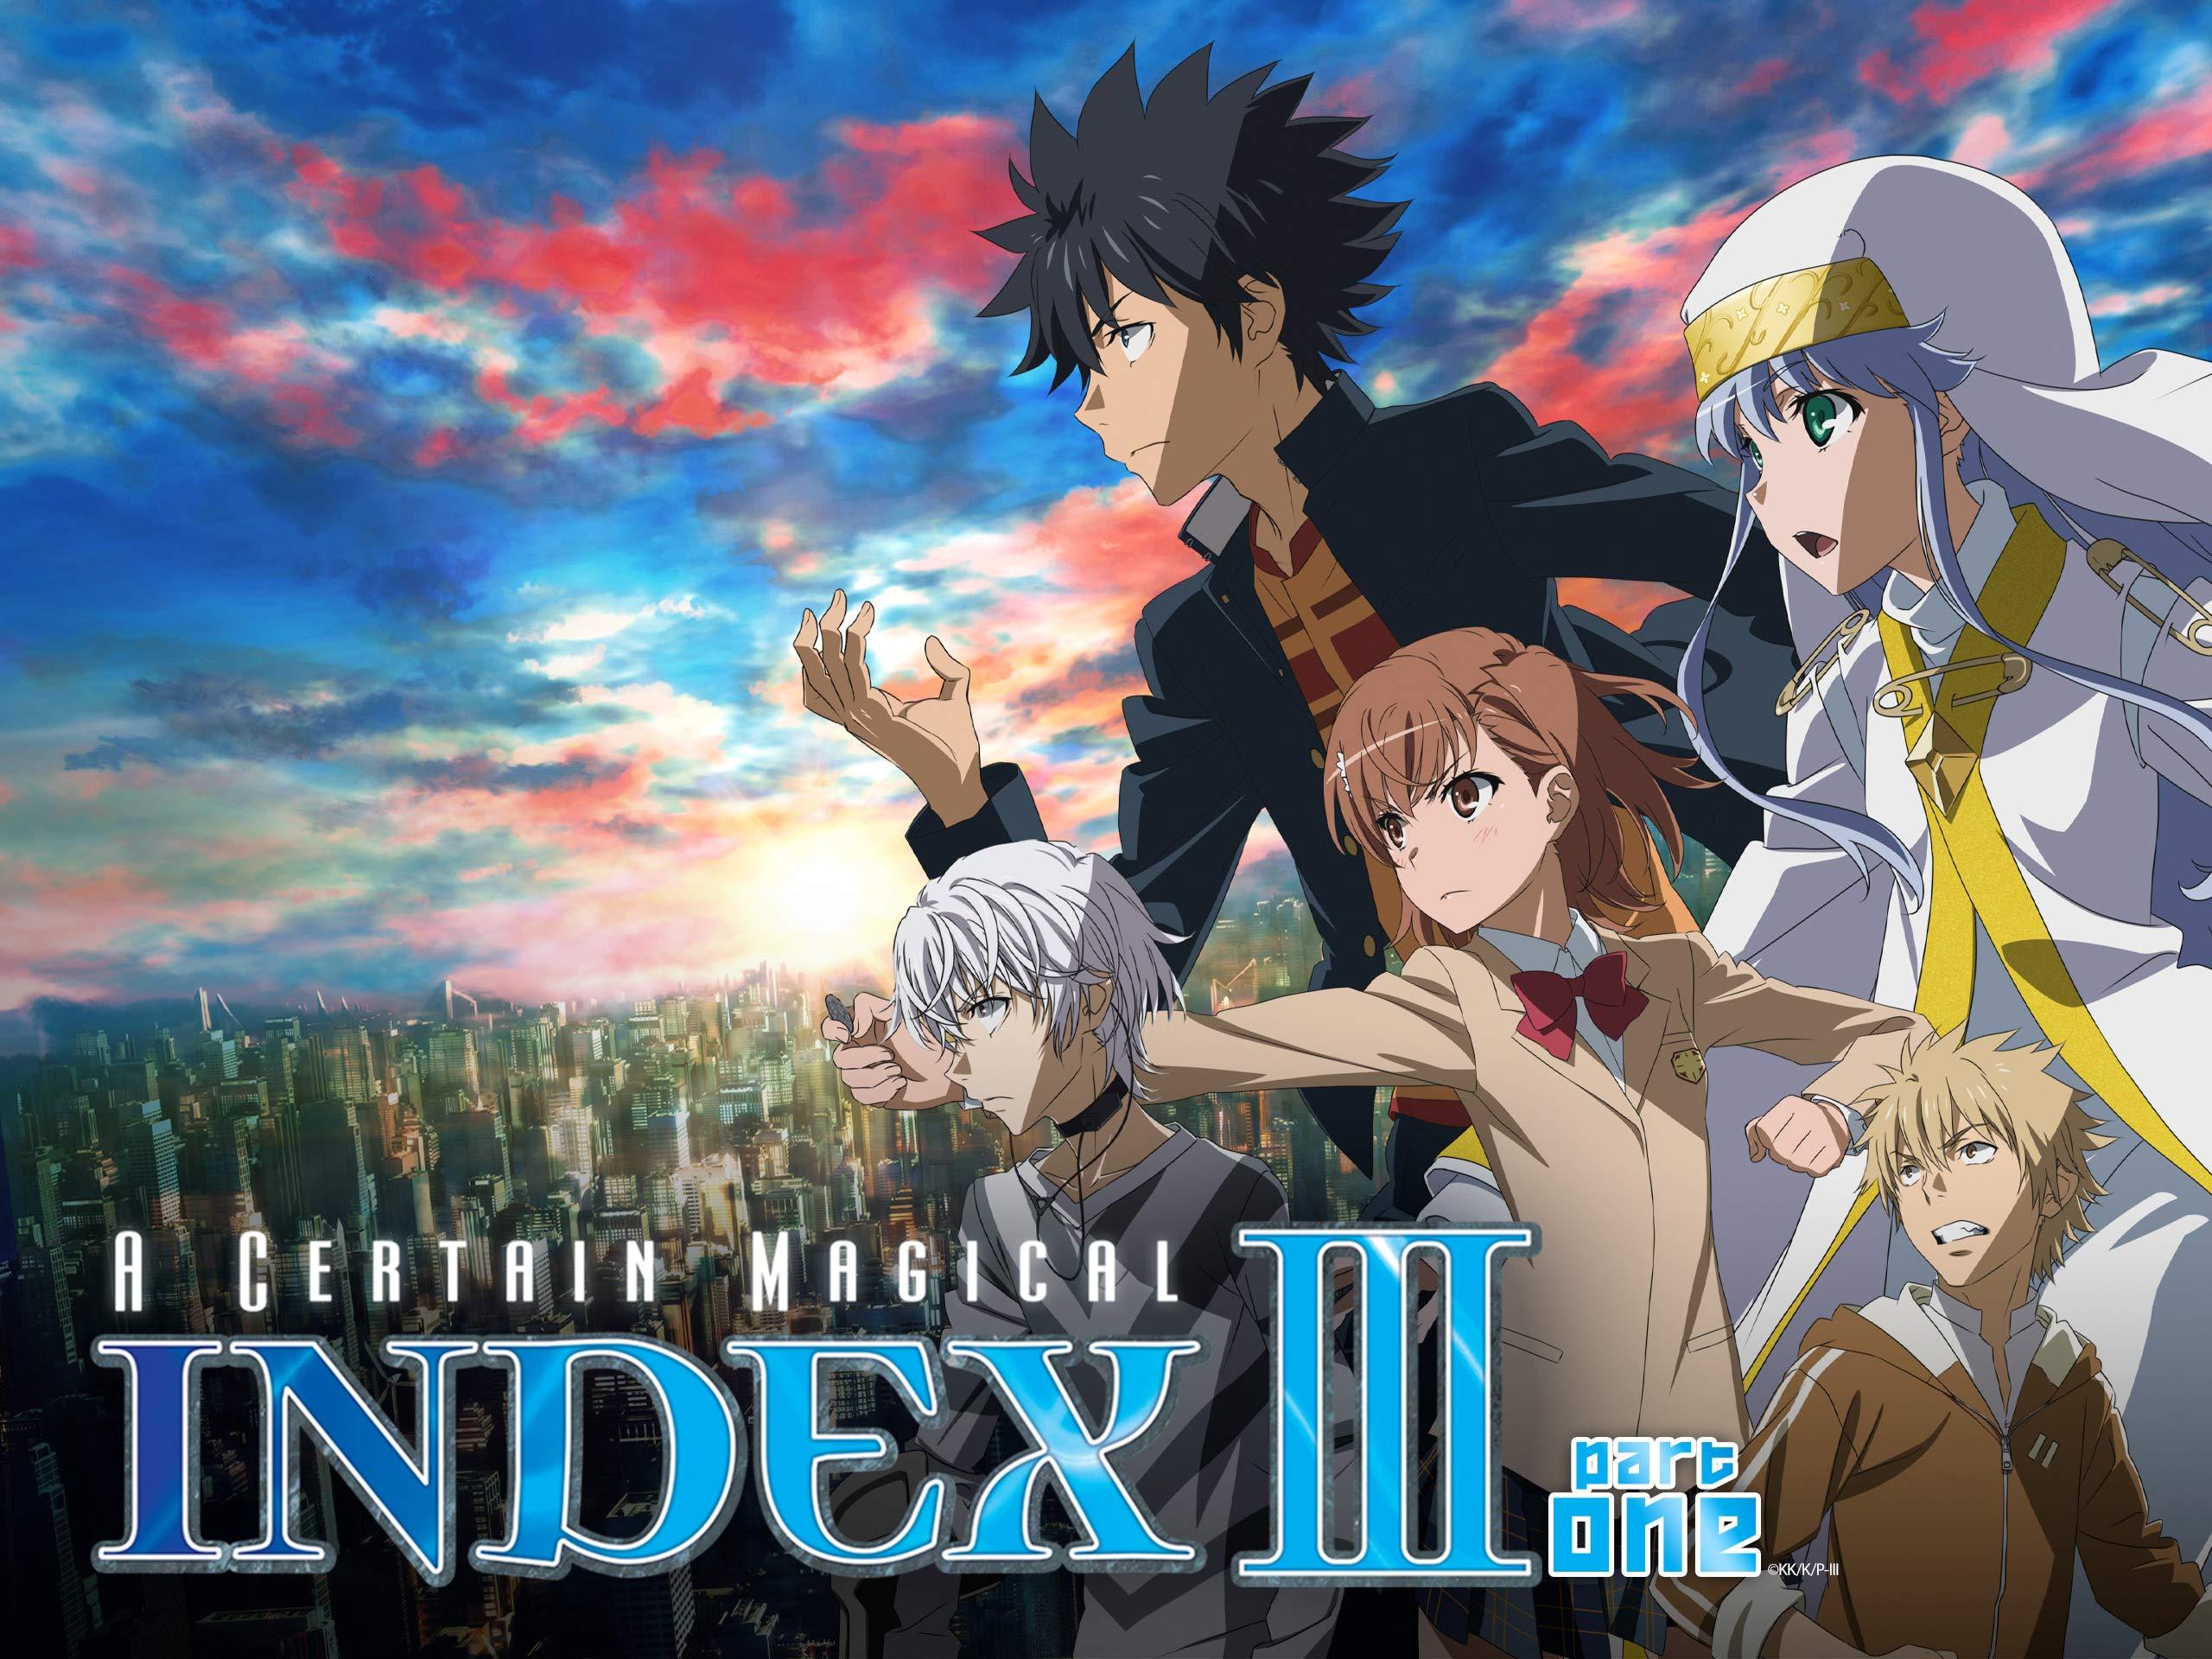 A Certain Magical Index anime visual